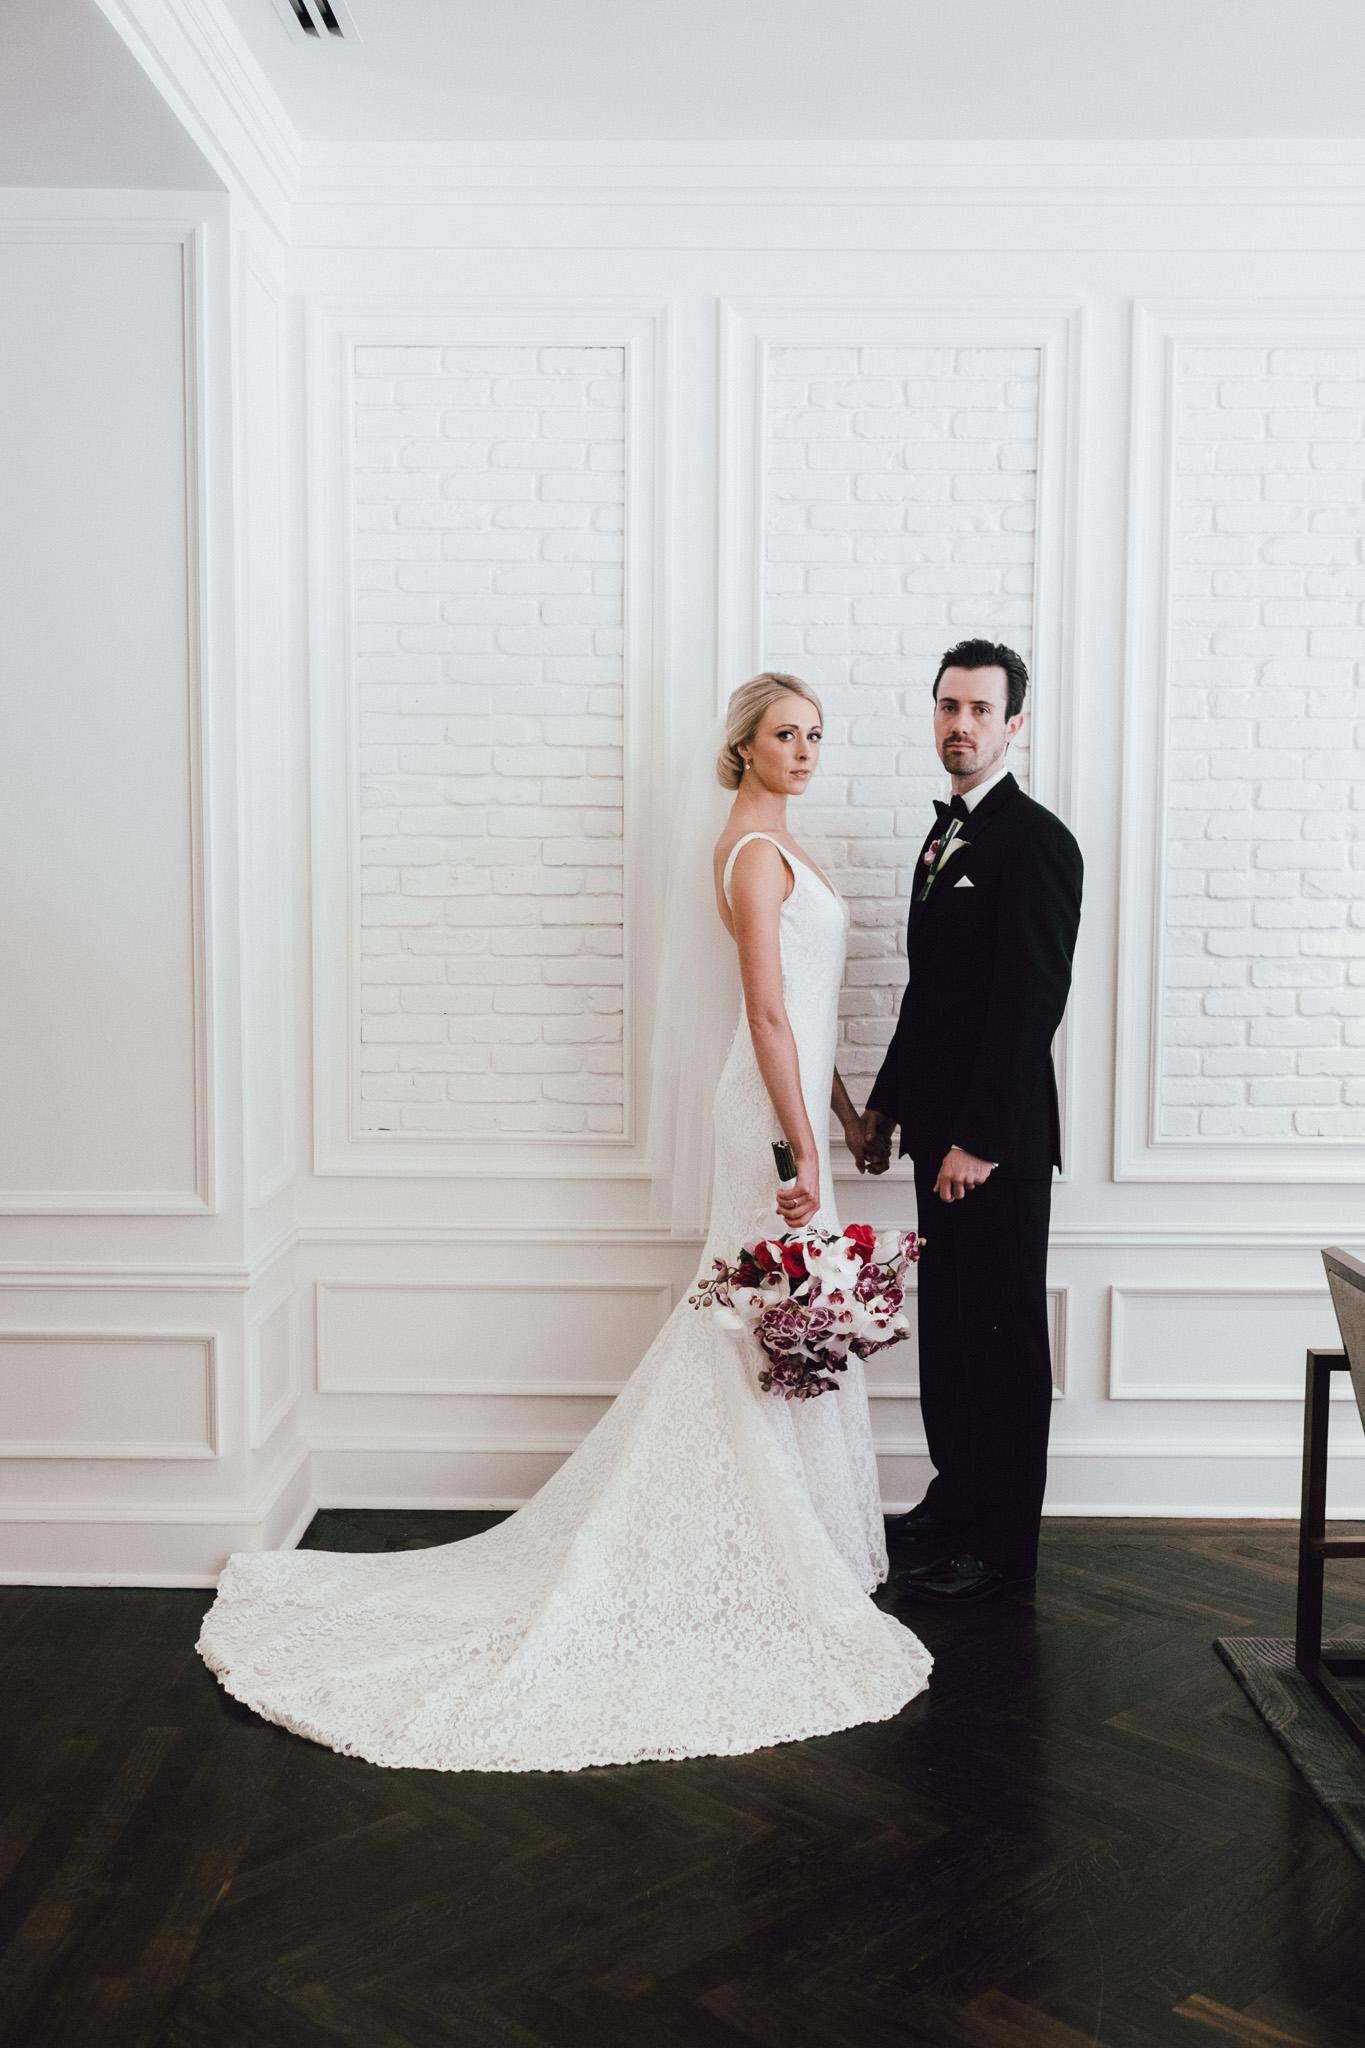 Brooke-Kyle-Indianapolis-Wedding-Blog-54.jpg